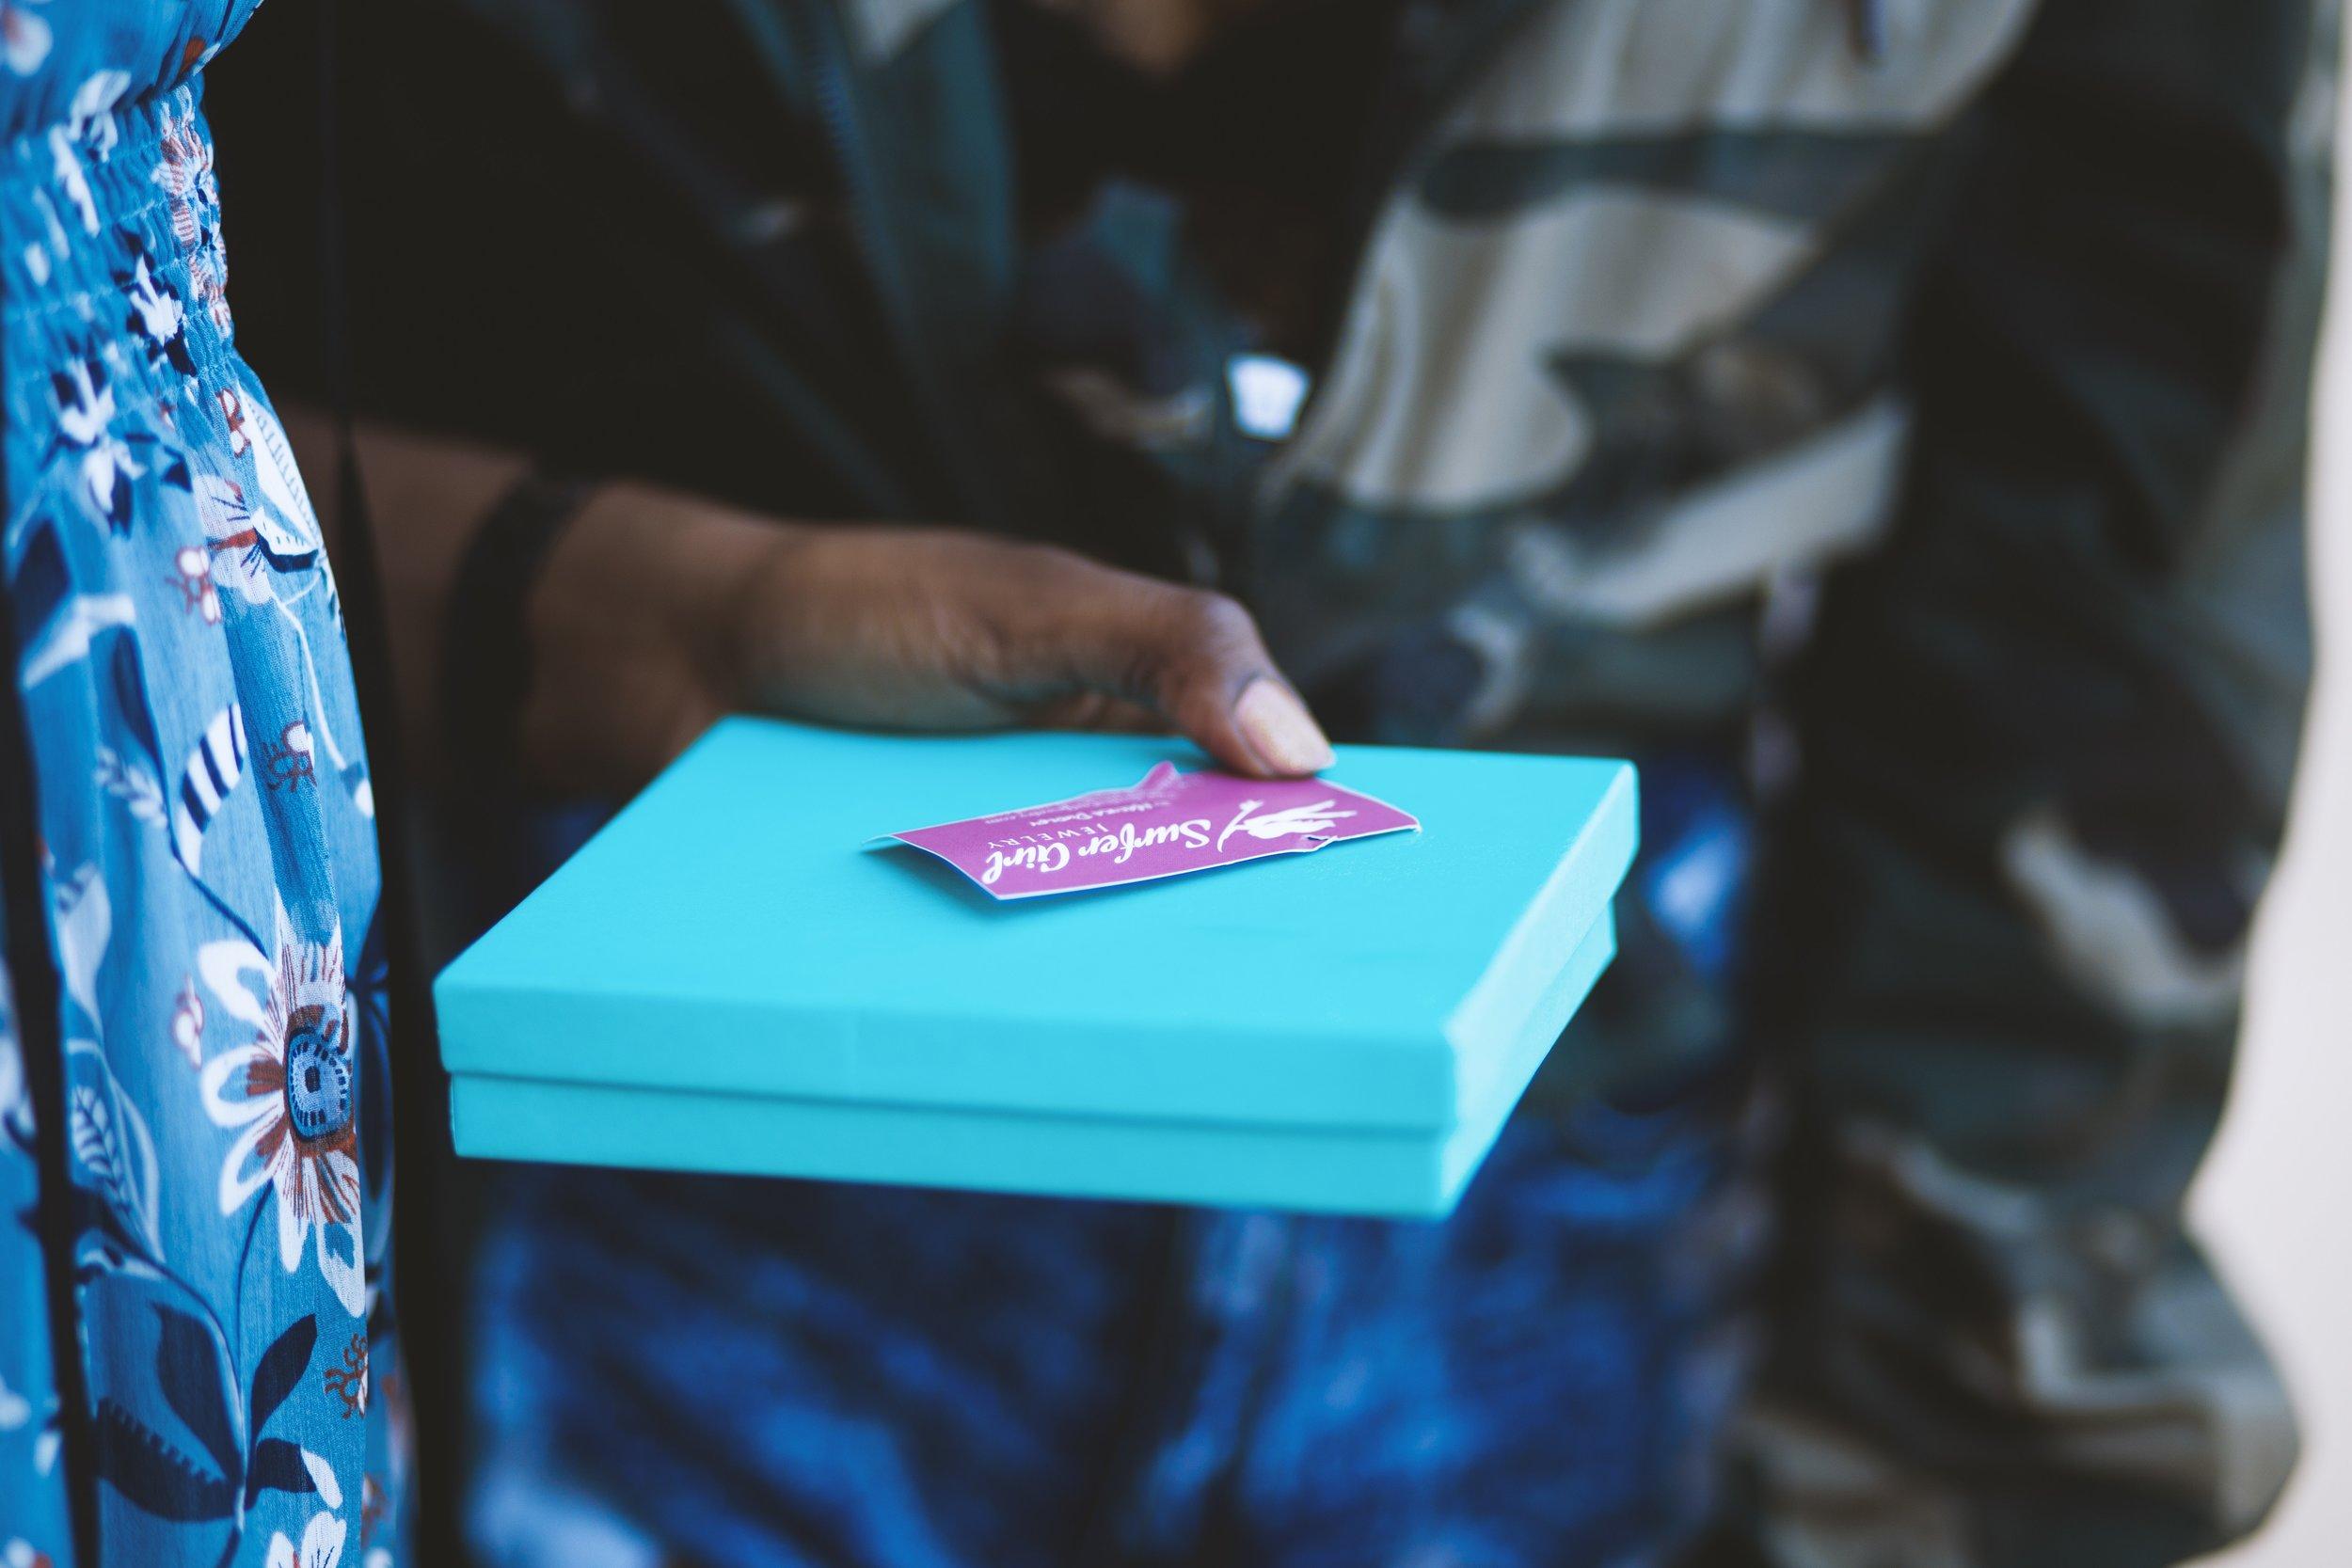 blue-box-card-1229180.jpg